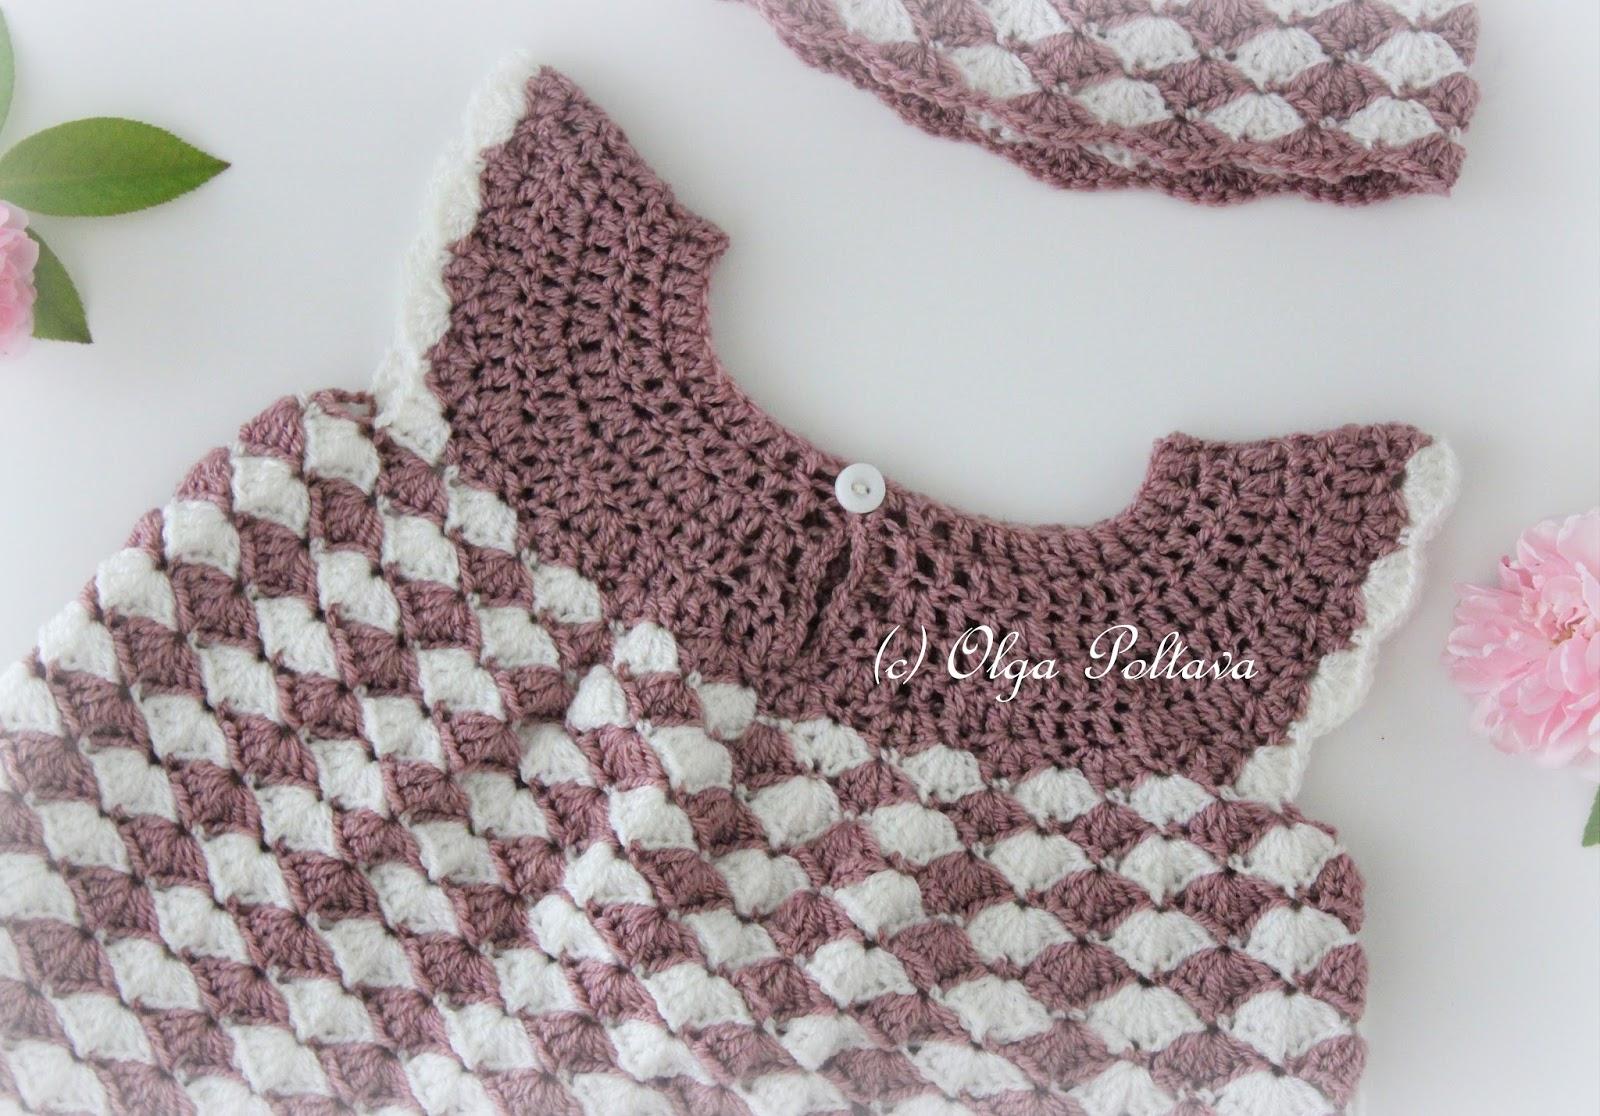 Lacy Crochet Shells Newborn Dress Free Crochet Pattern